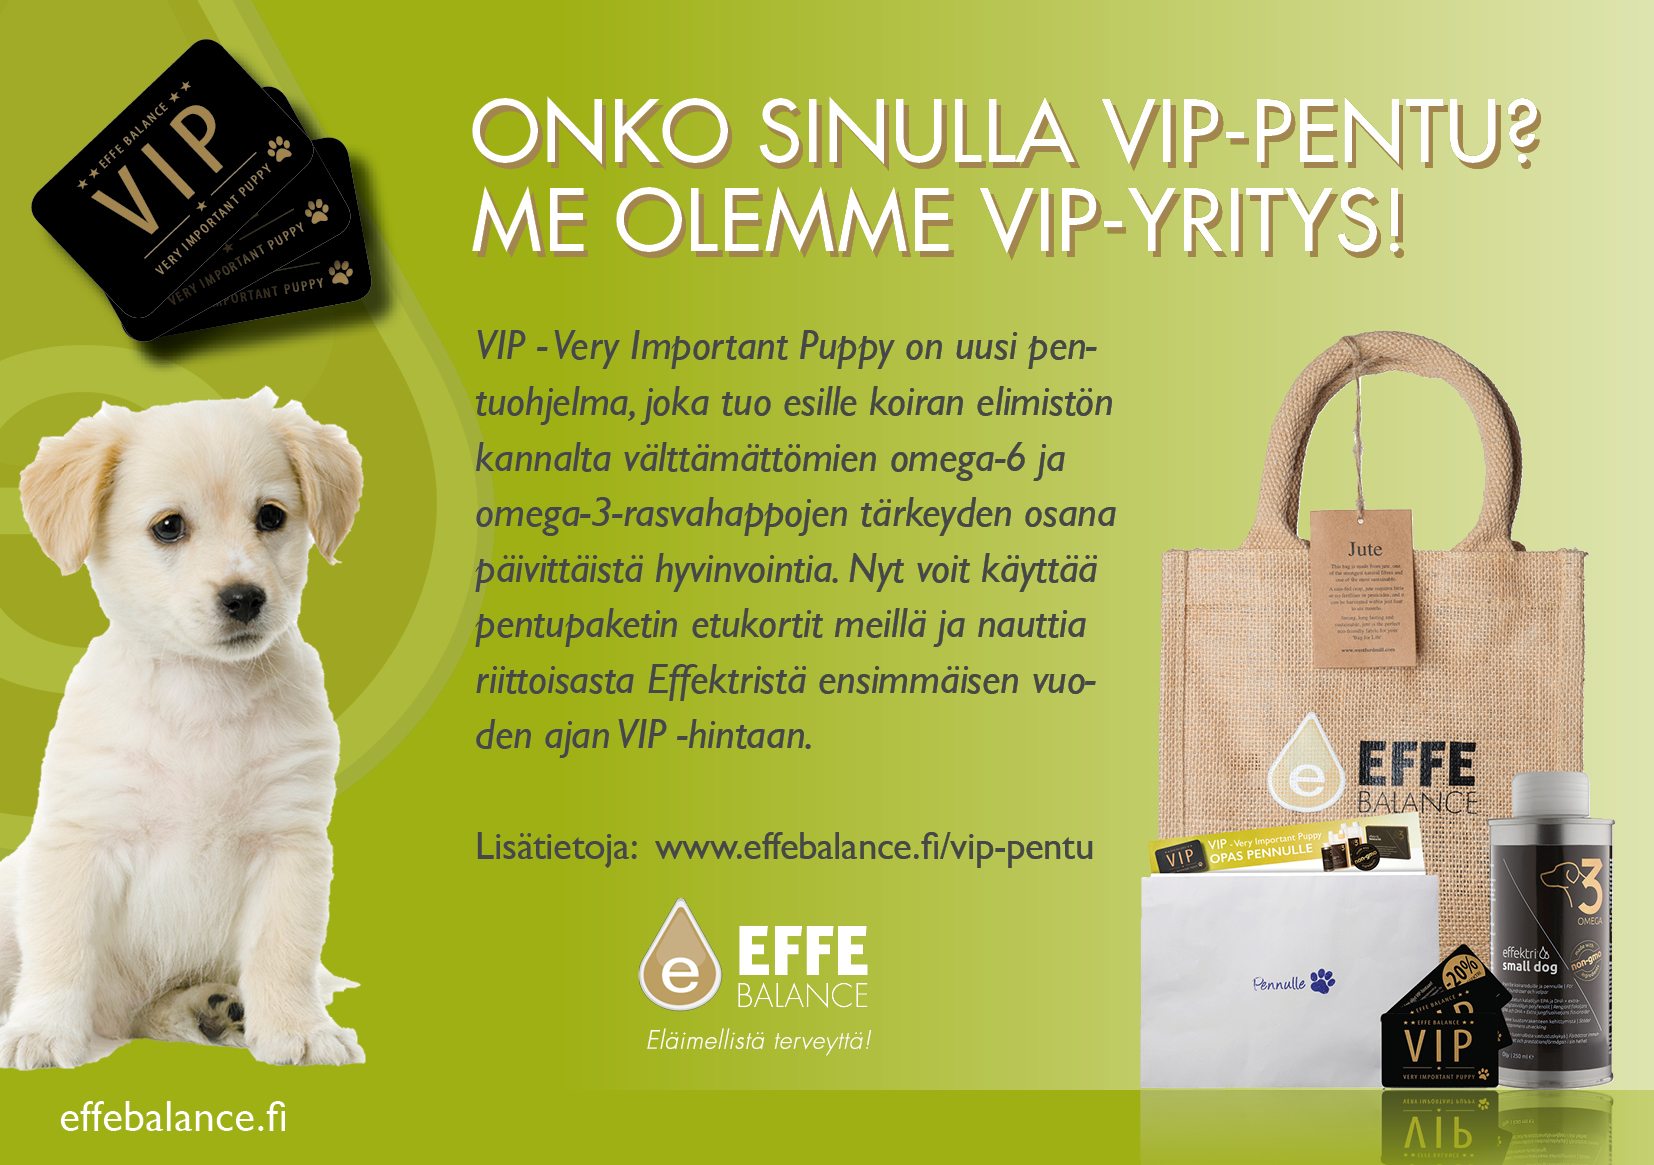 VIP-pentu_effe